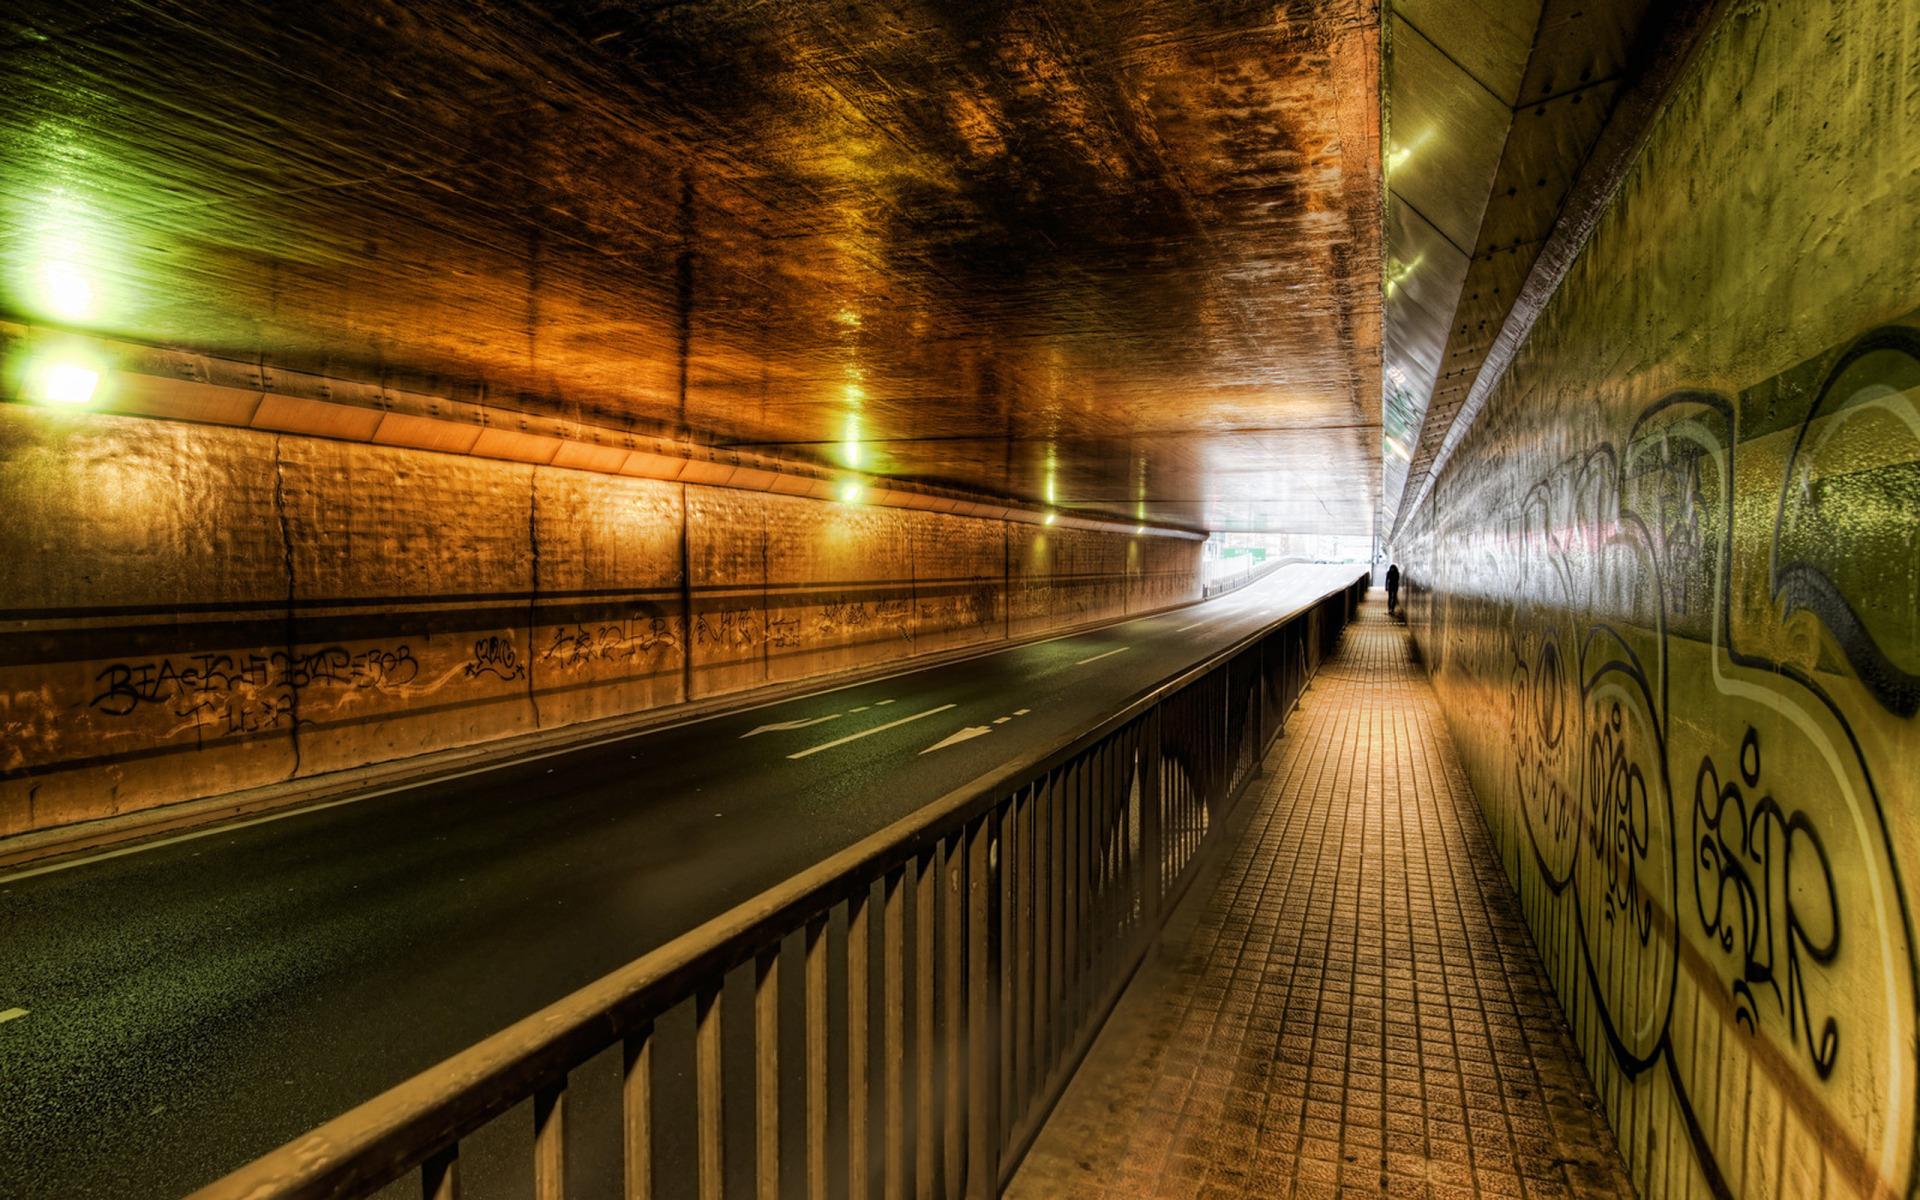 Road Tunnel Wallpaper HD